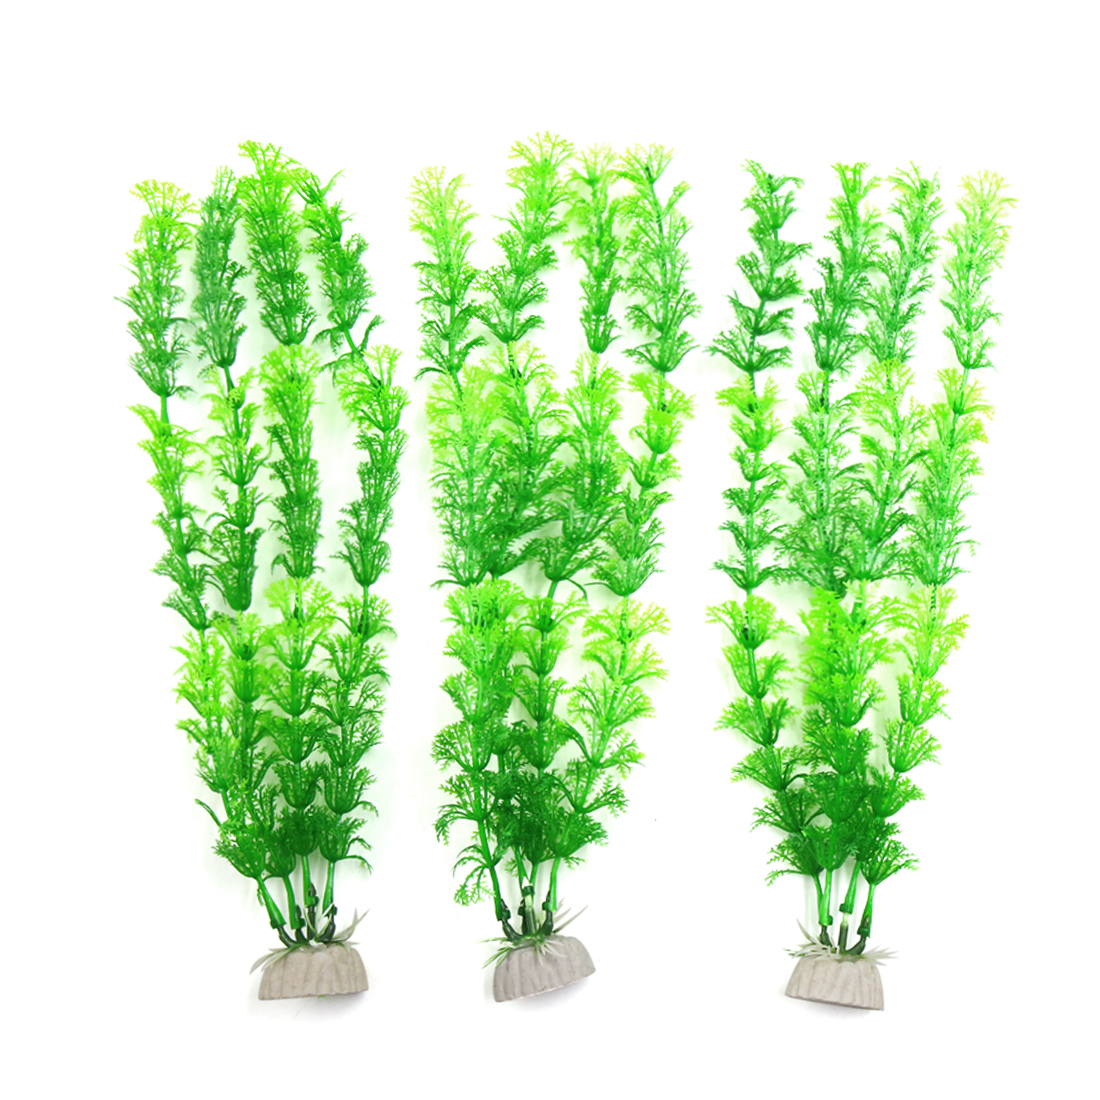 3pcs Green Plastic Aquarium Fish Tank Water Grass Plant Decorative Ornament